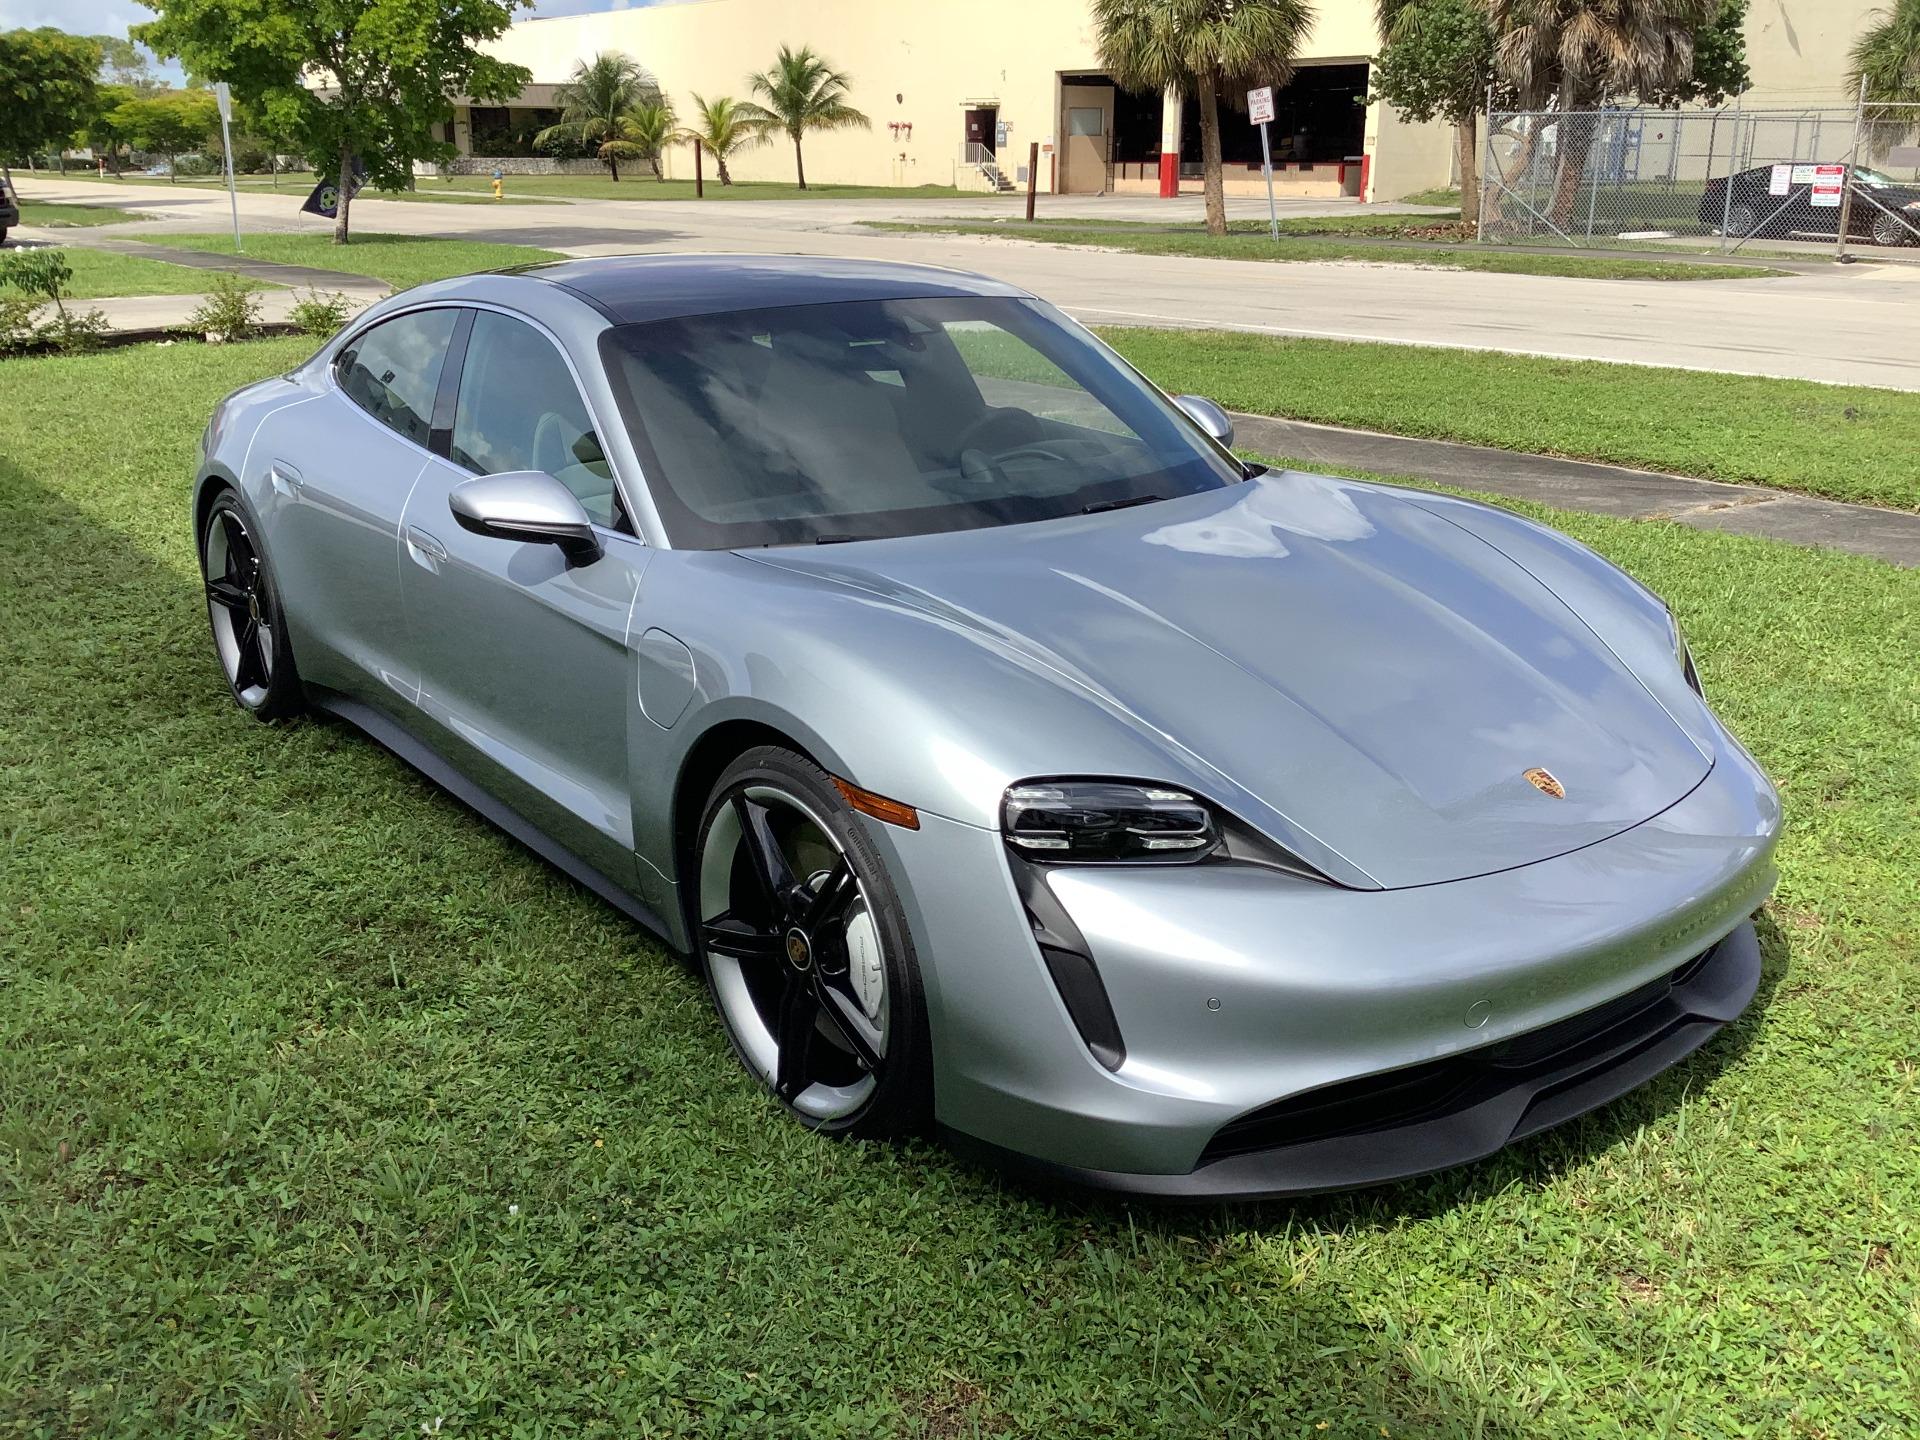 2020 Porsche Taycan 4s For Sale In Miami Fl A50698 All Sports Motor Network